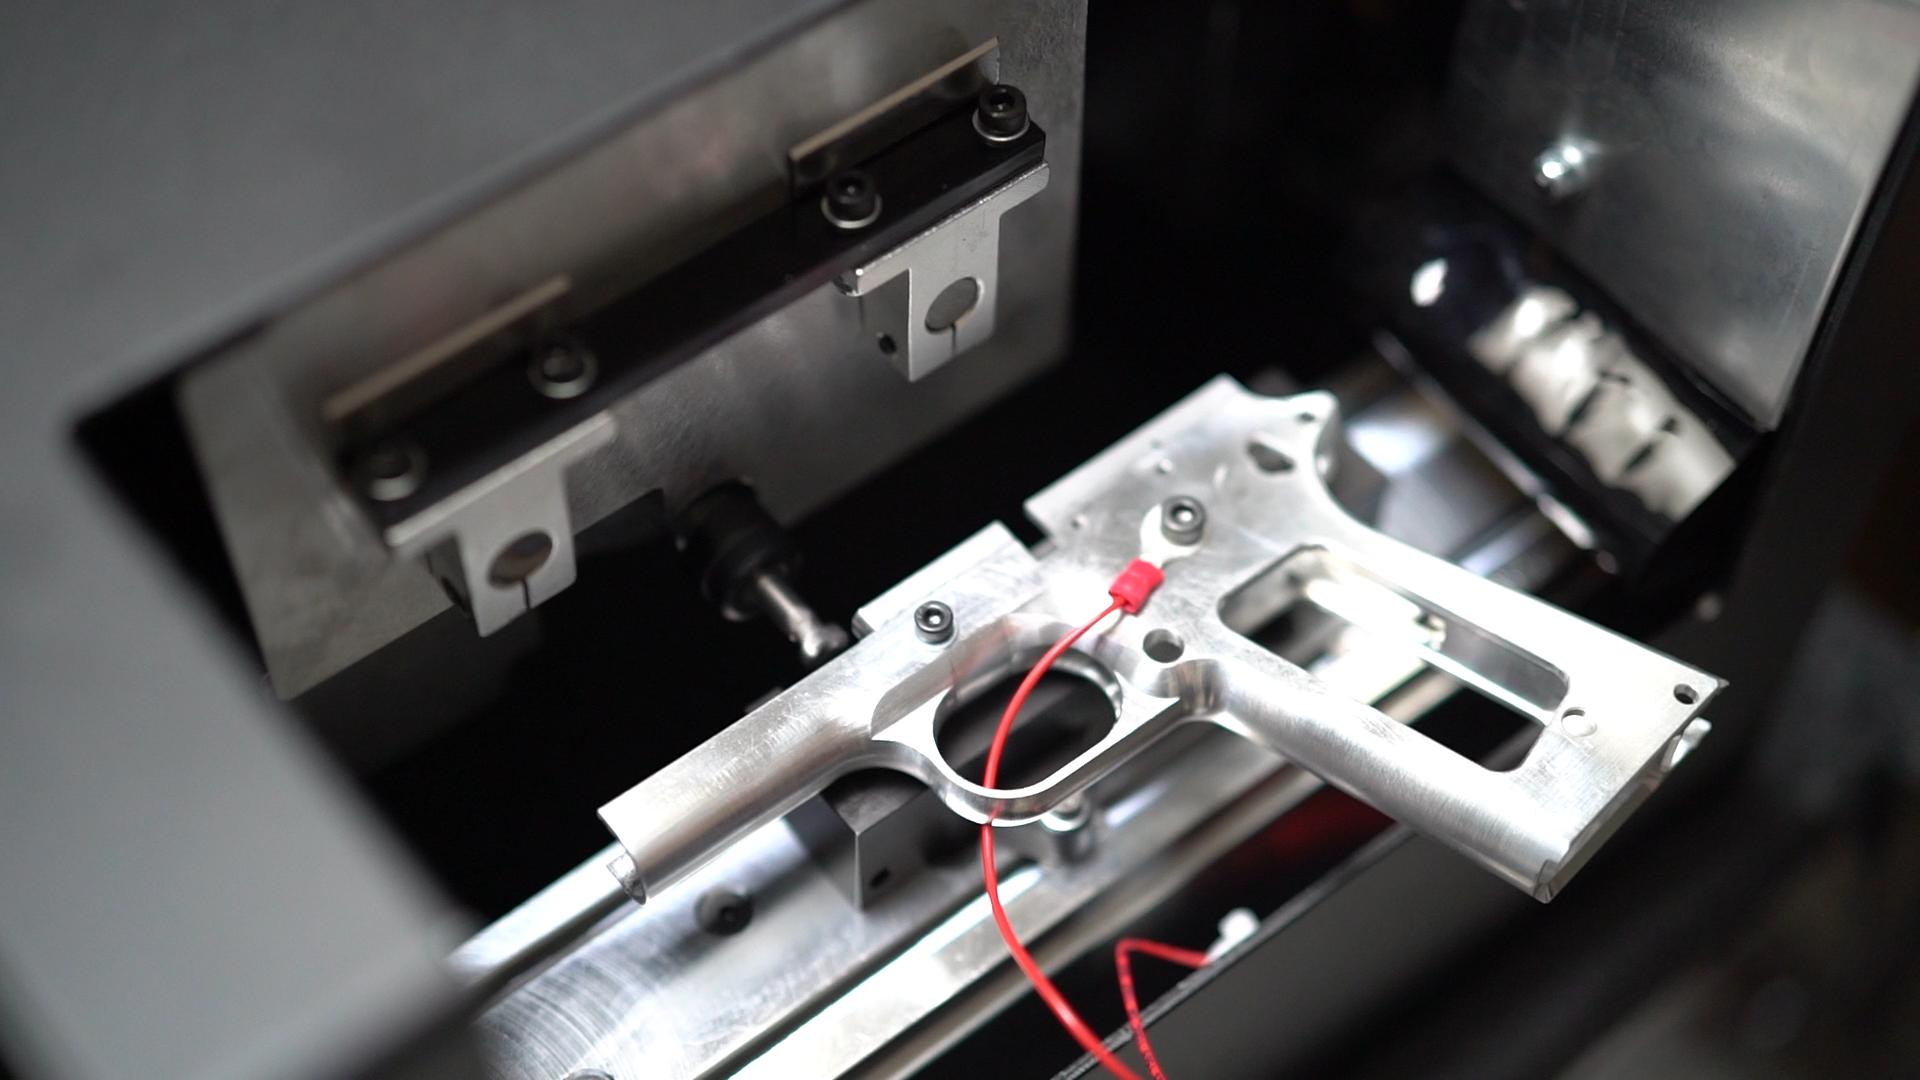 Technology Could Help You Build an Untraceable Gun  Should